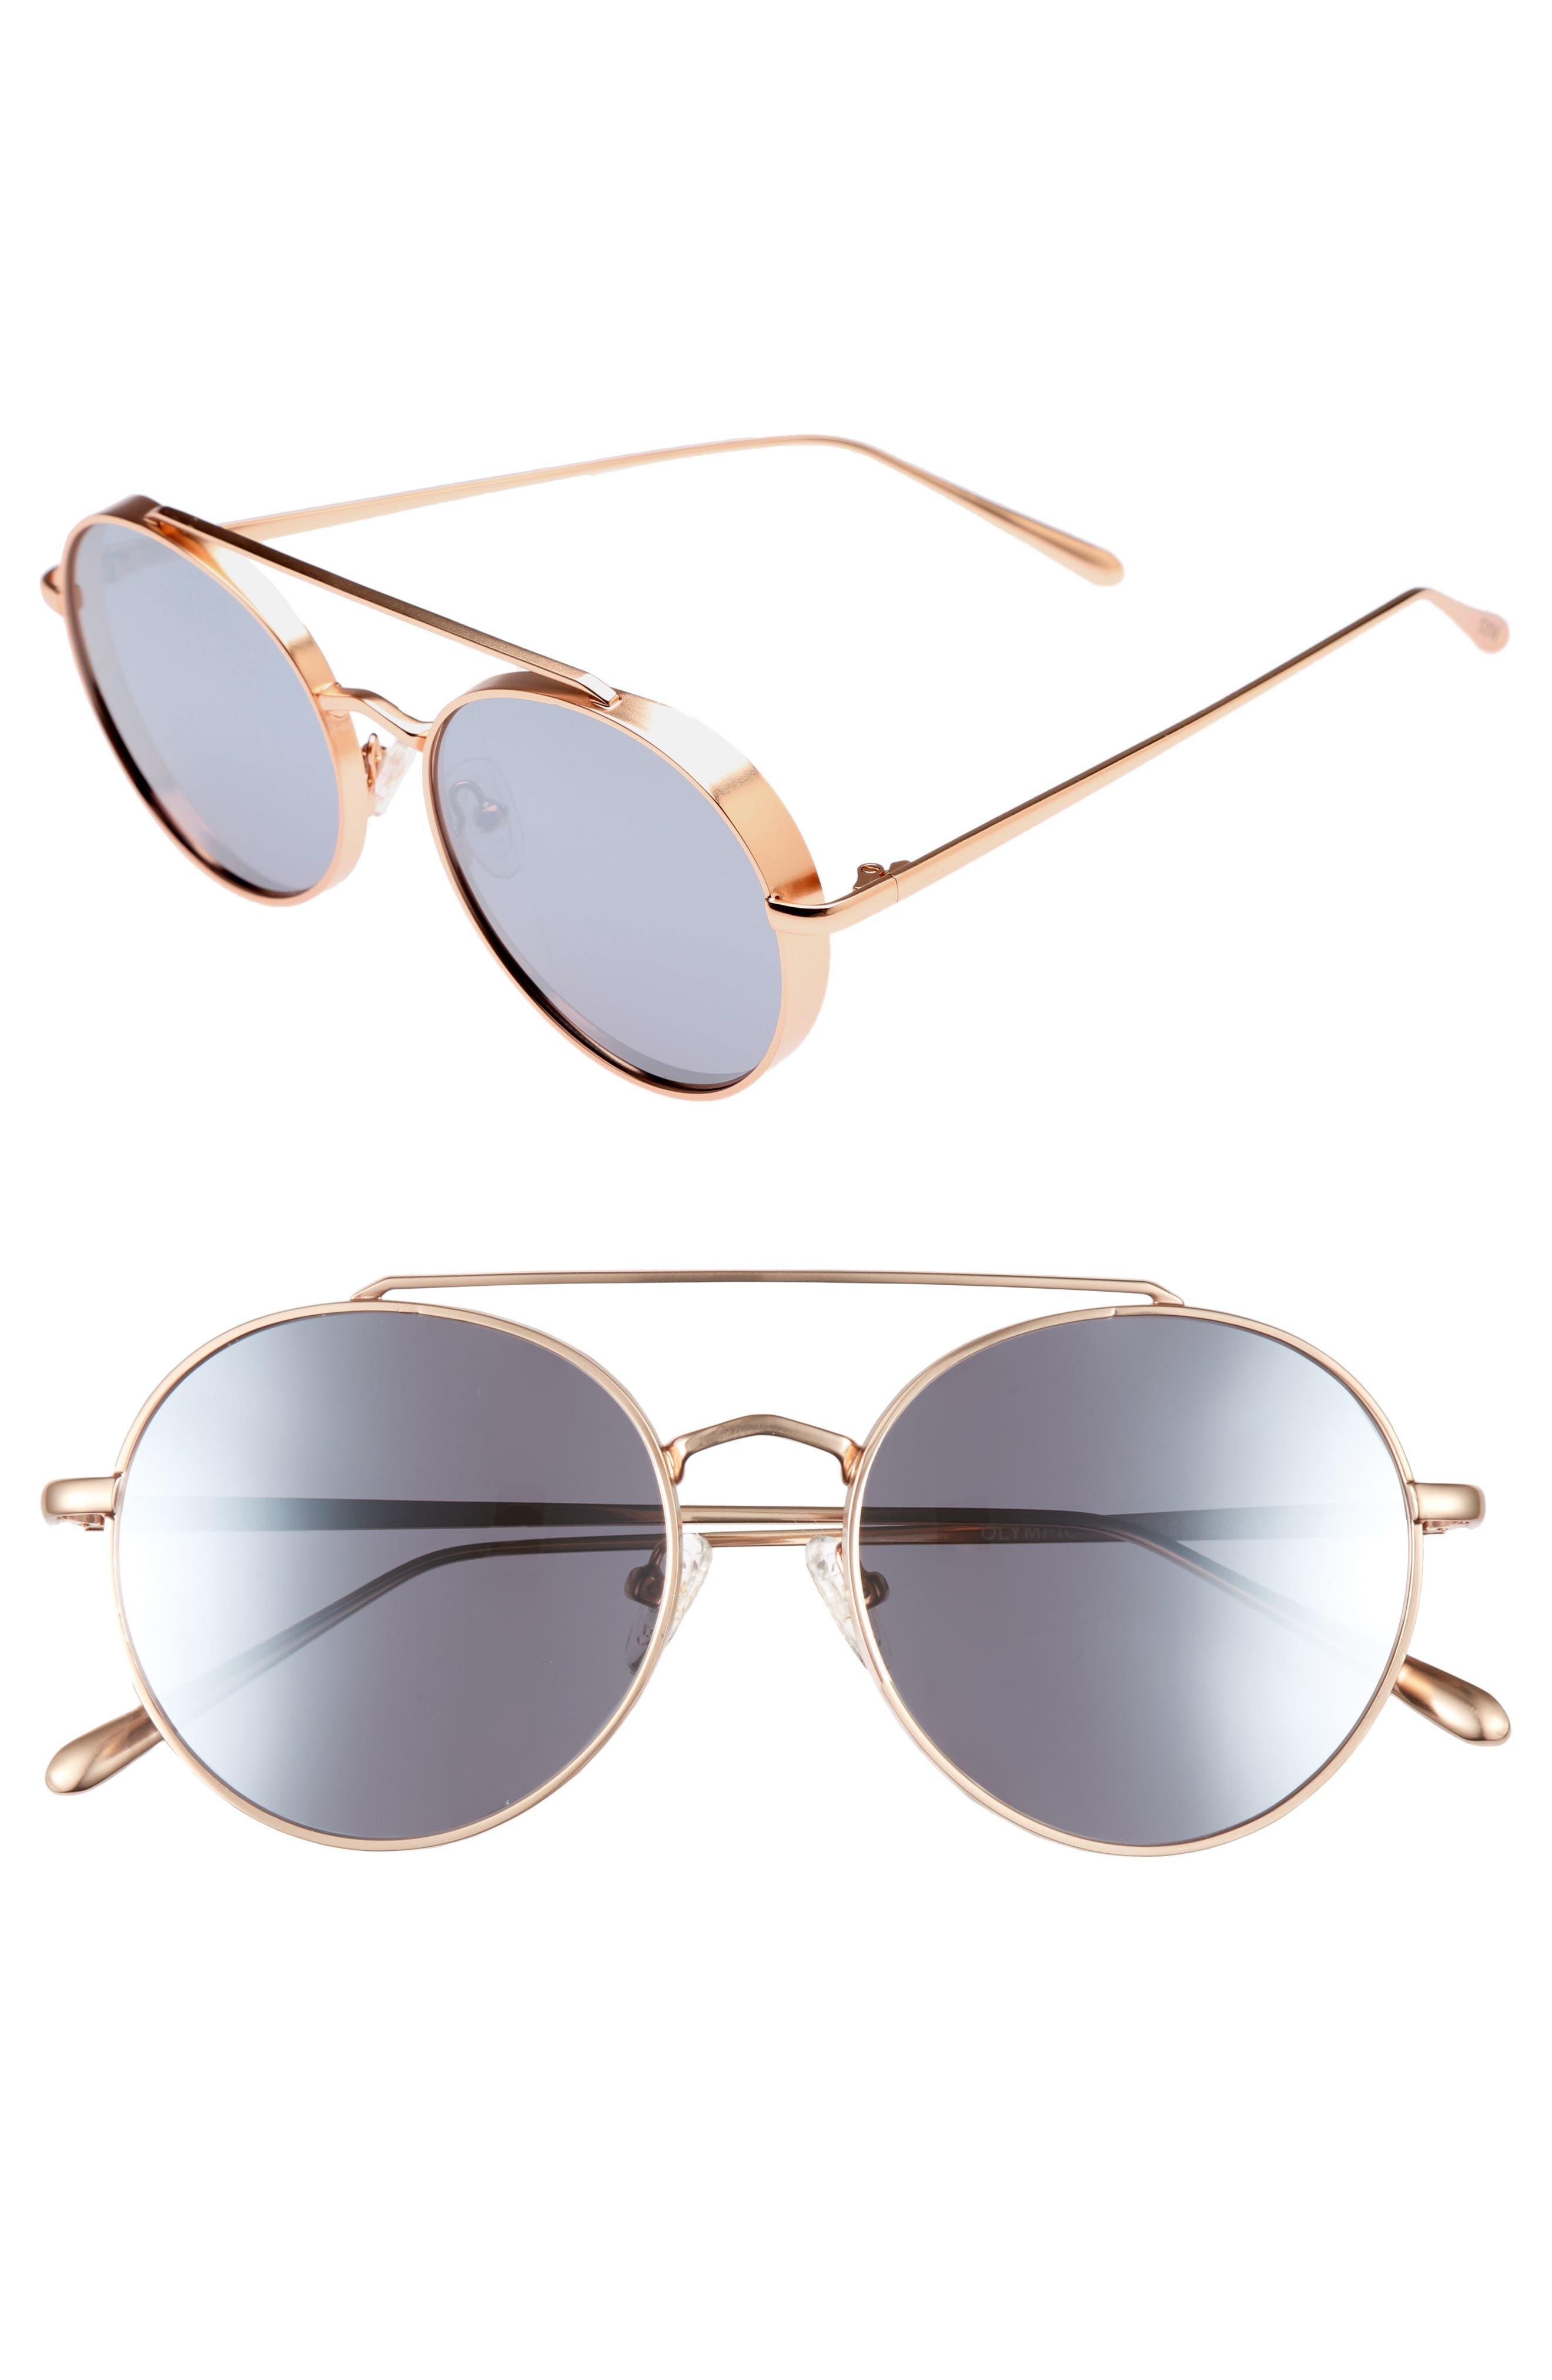 Main Image - Bonnie Clyde Olympic 53mm Polarized Aviator Sunglasses